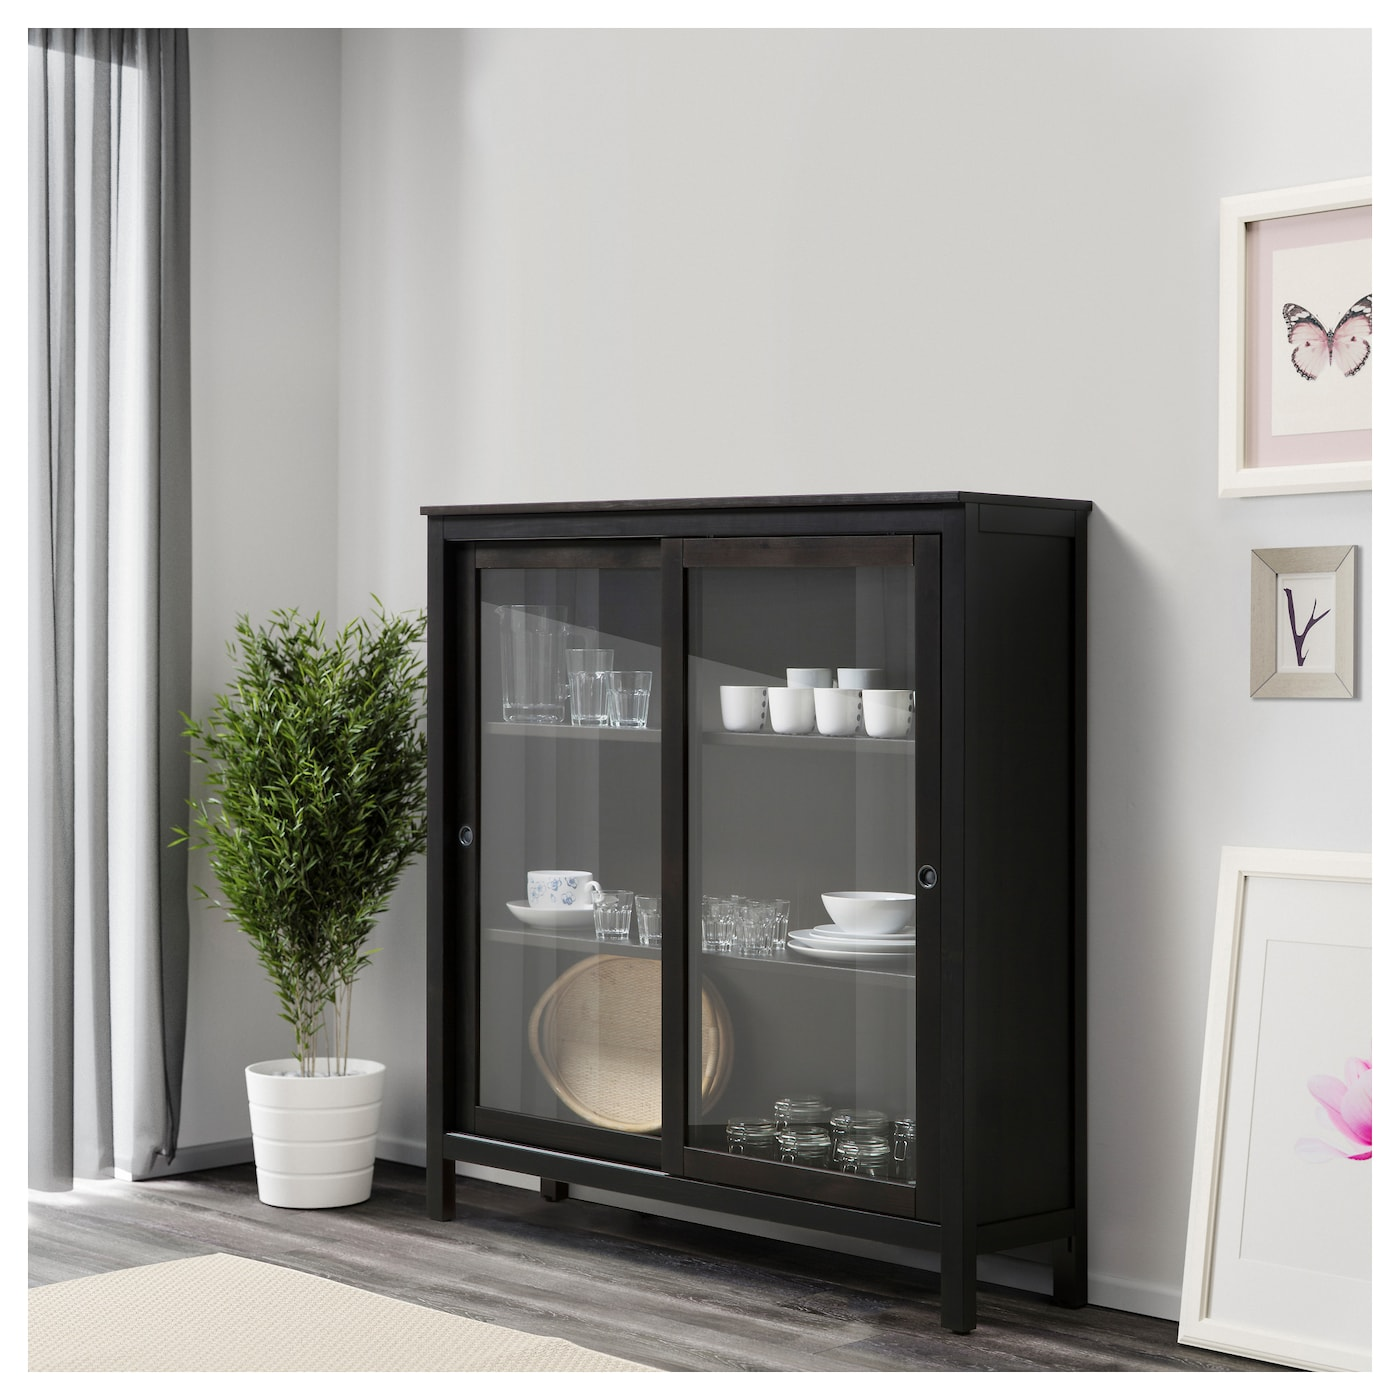 hemnes vitrine brun noir 120 x 130 cm - ikea